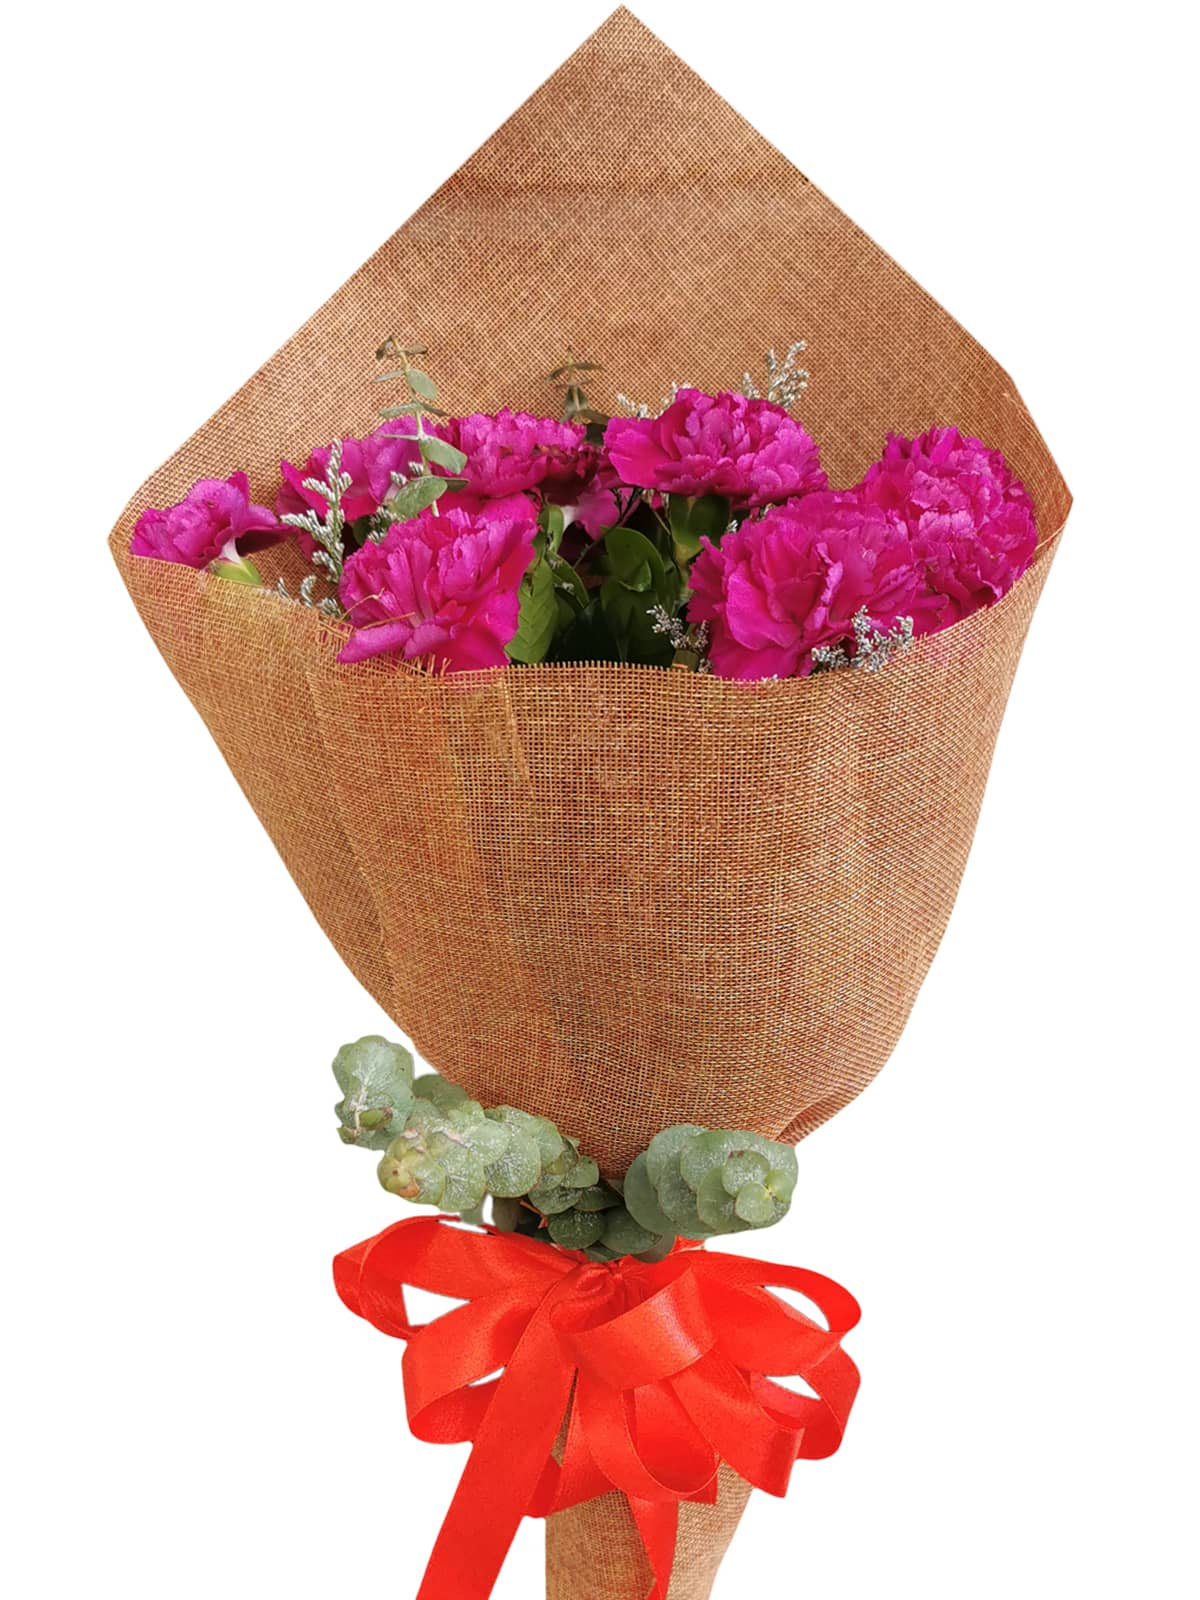 PURPLE Carnation Burlap ch